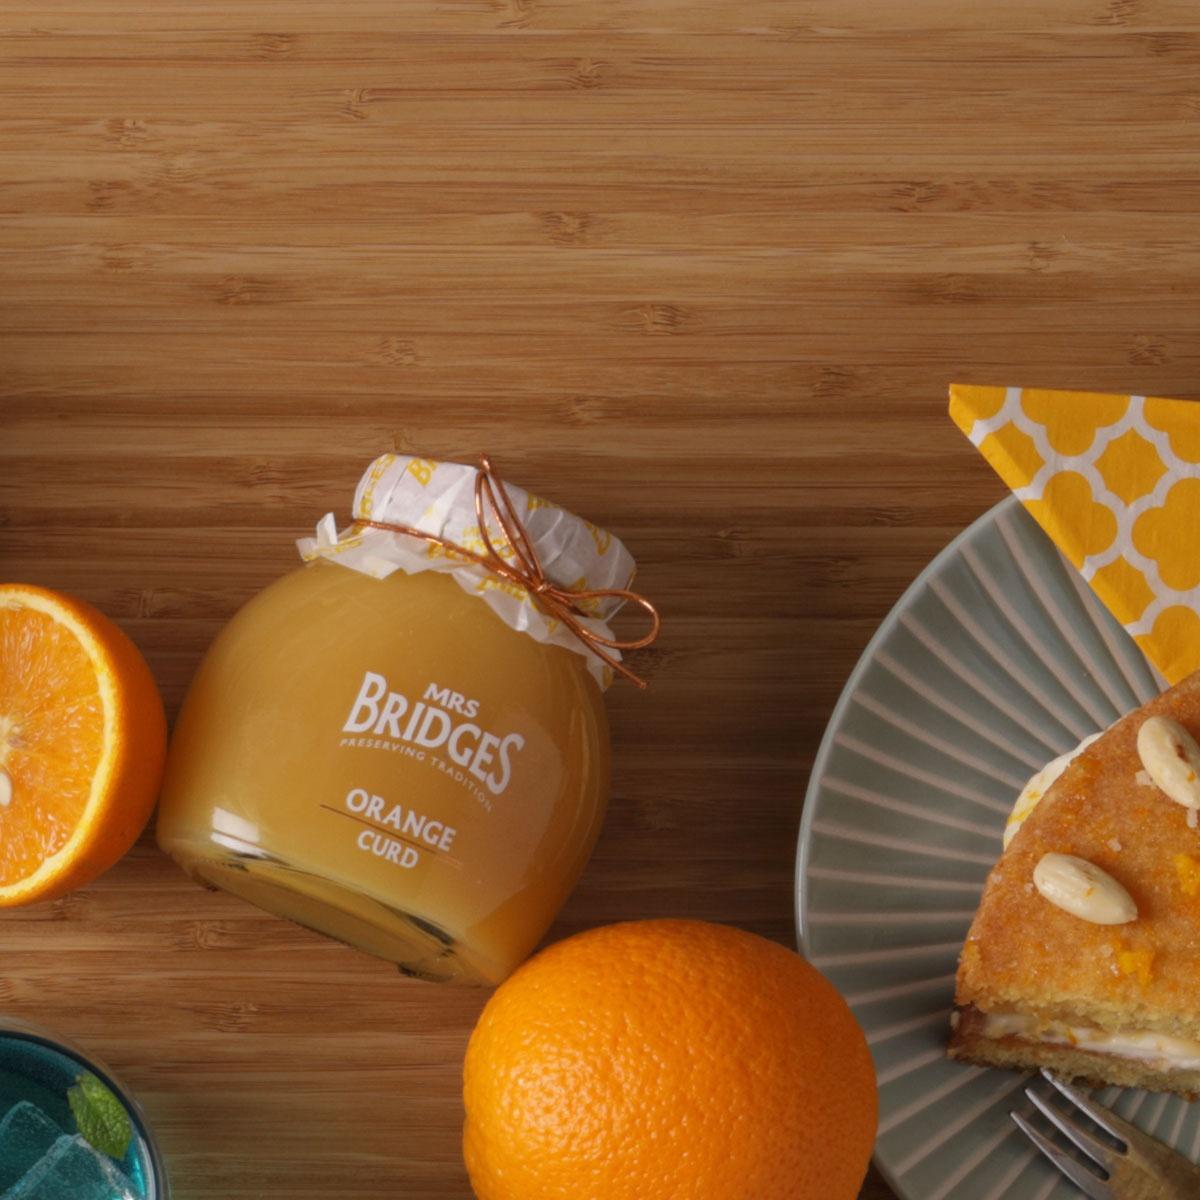 Top Food Feinkost - Mrs Bridges Orange Curd Cake